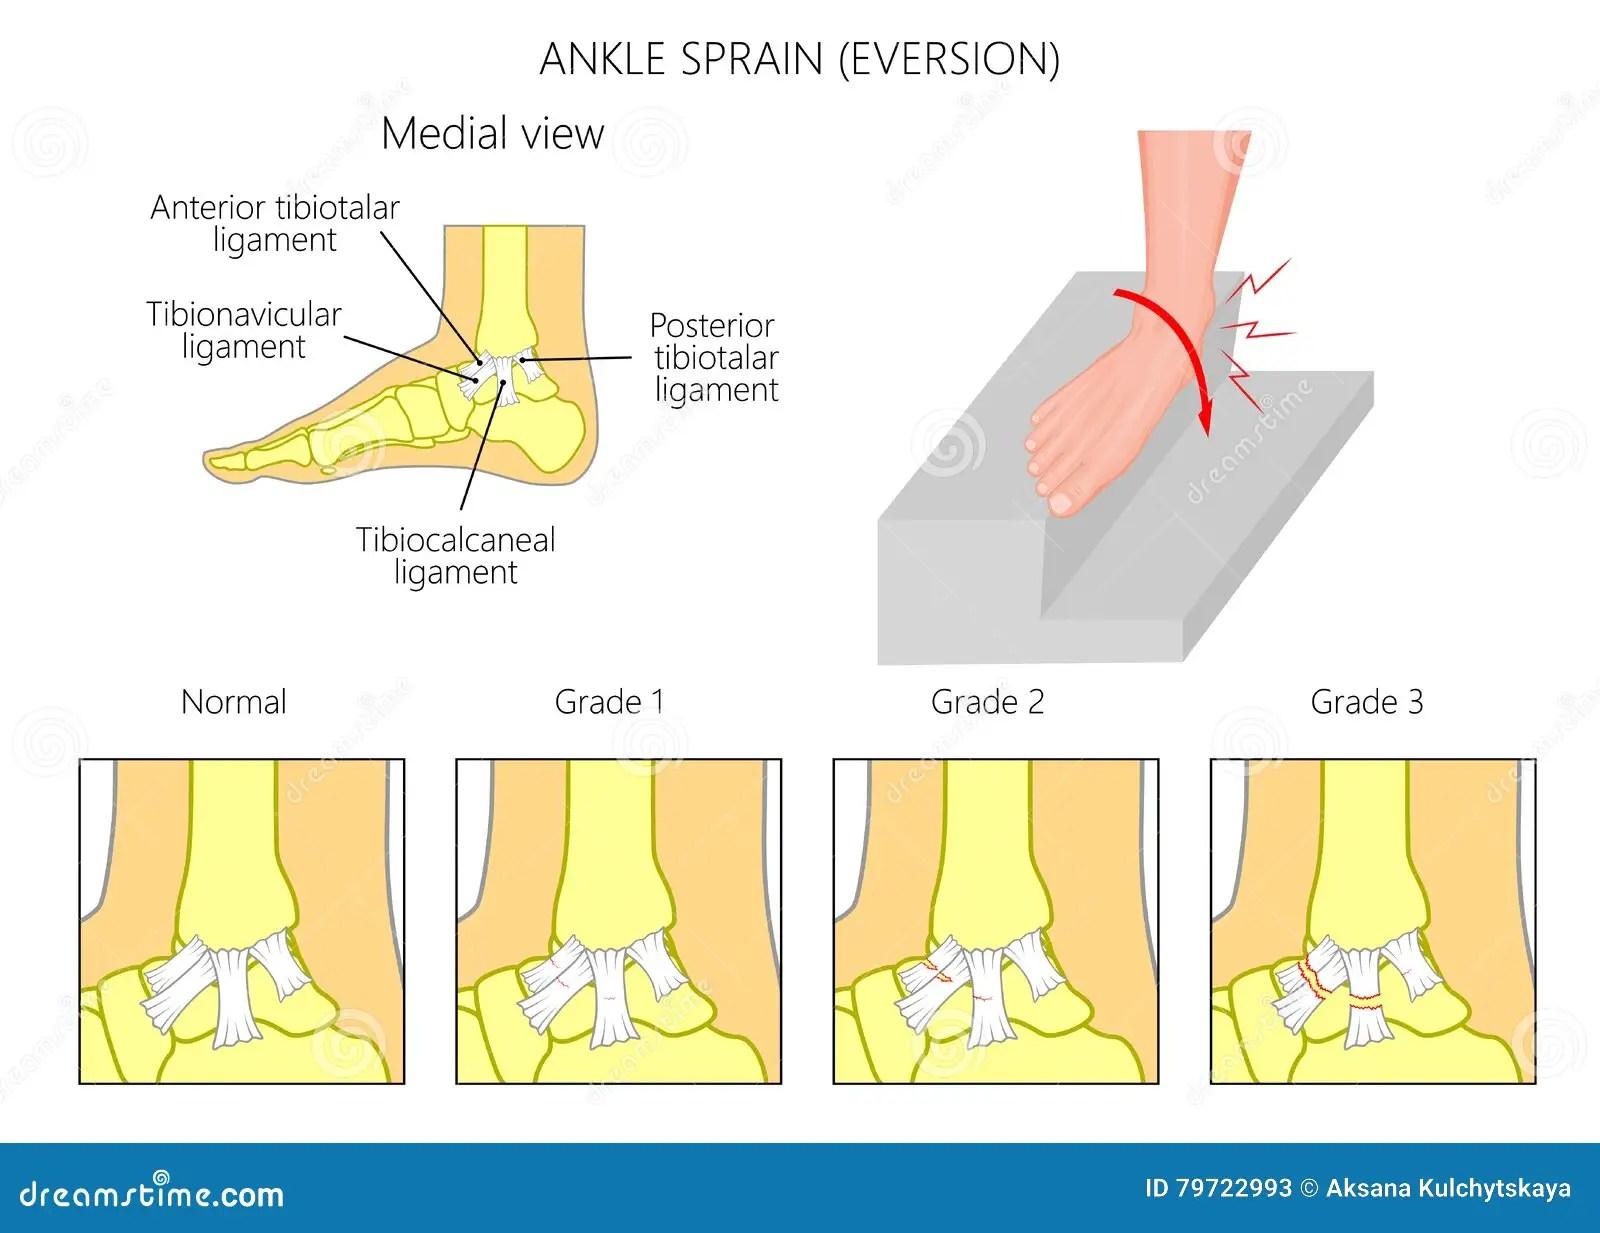 Anatomy Of An Ankle Sprain E Version